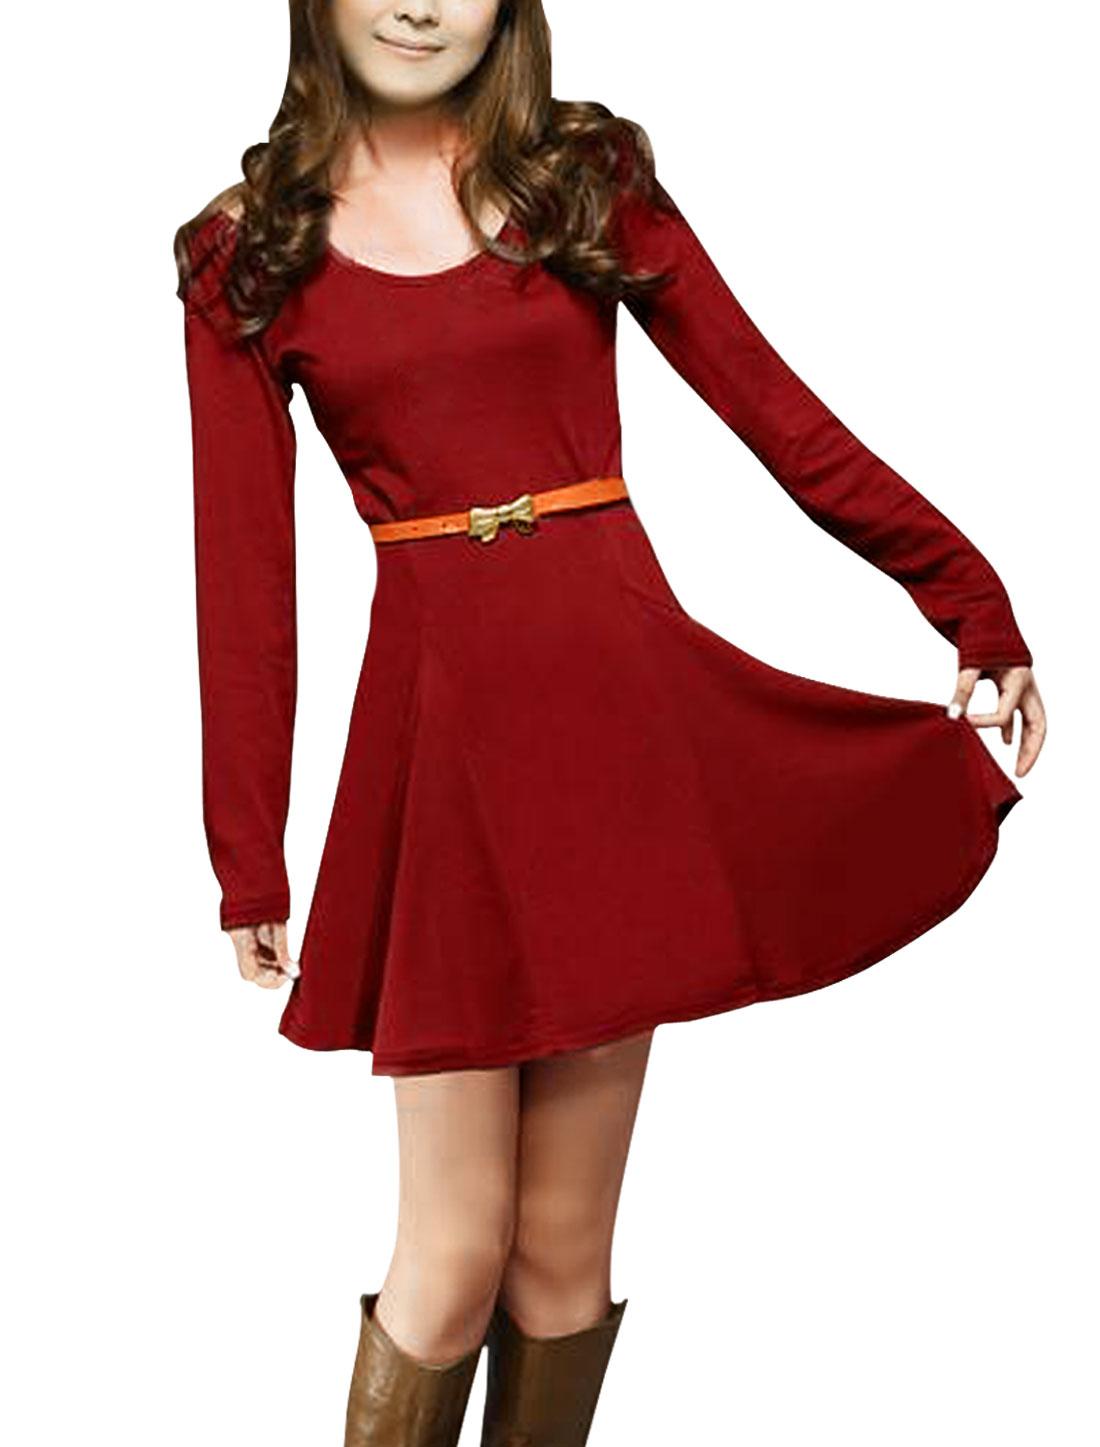 Lady Ruffled Detail Cut Out Shoulders Dress w Belt Burgundy XL